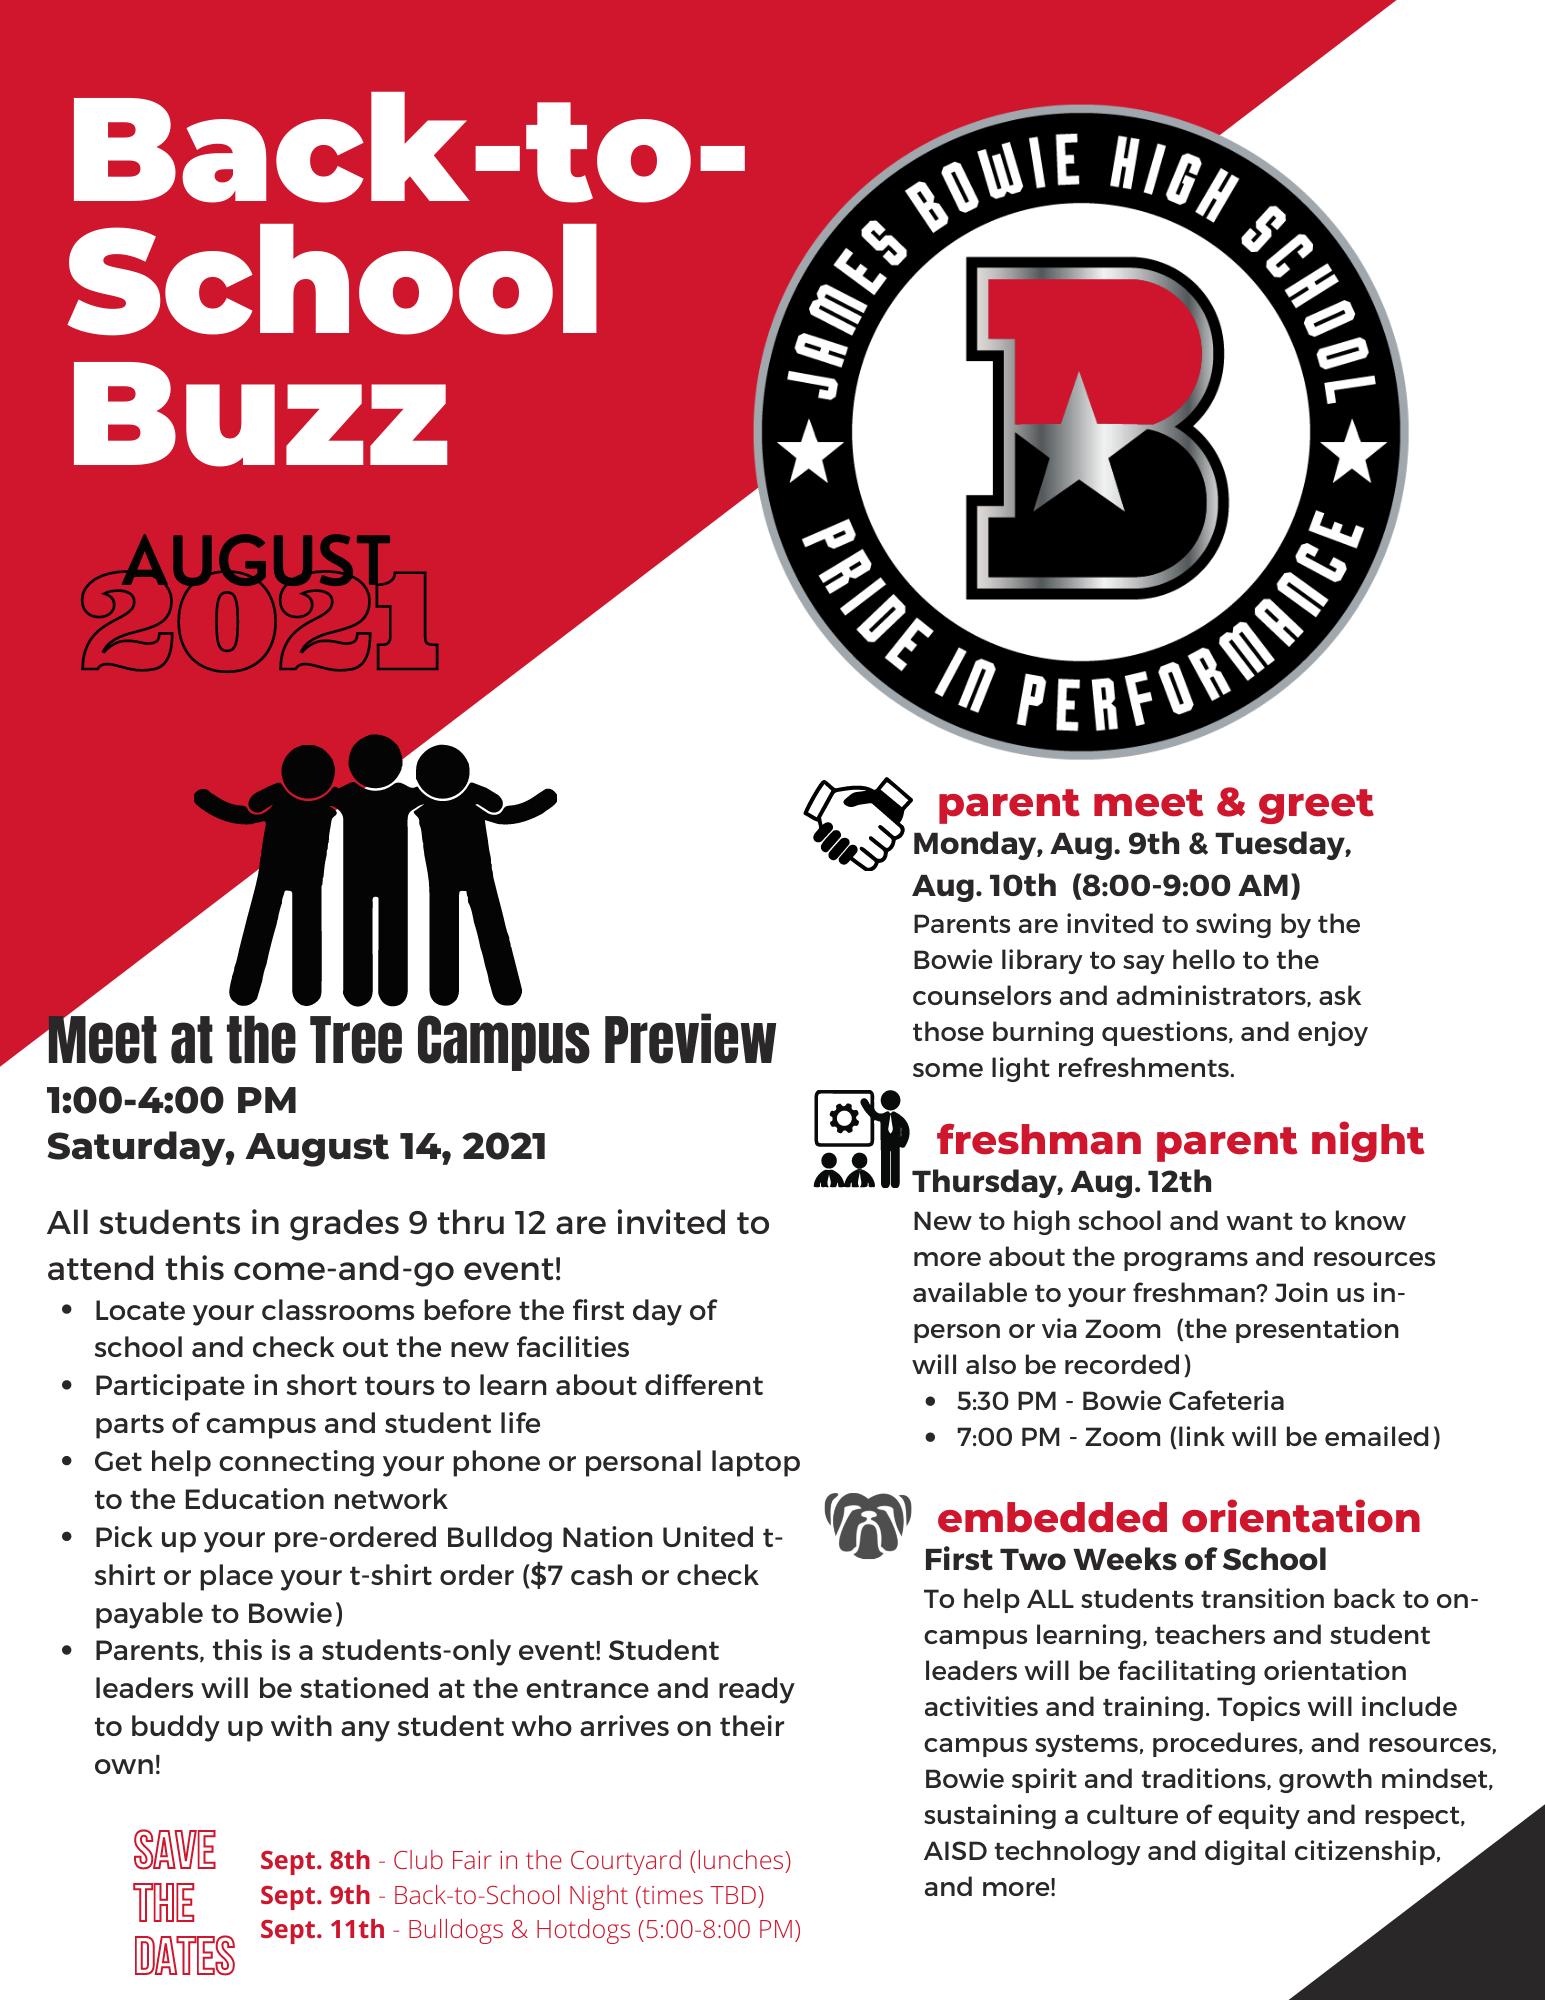 Back to School Buzz flyer